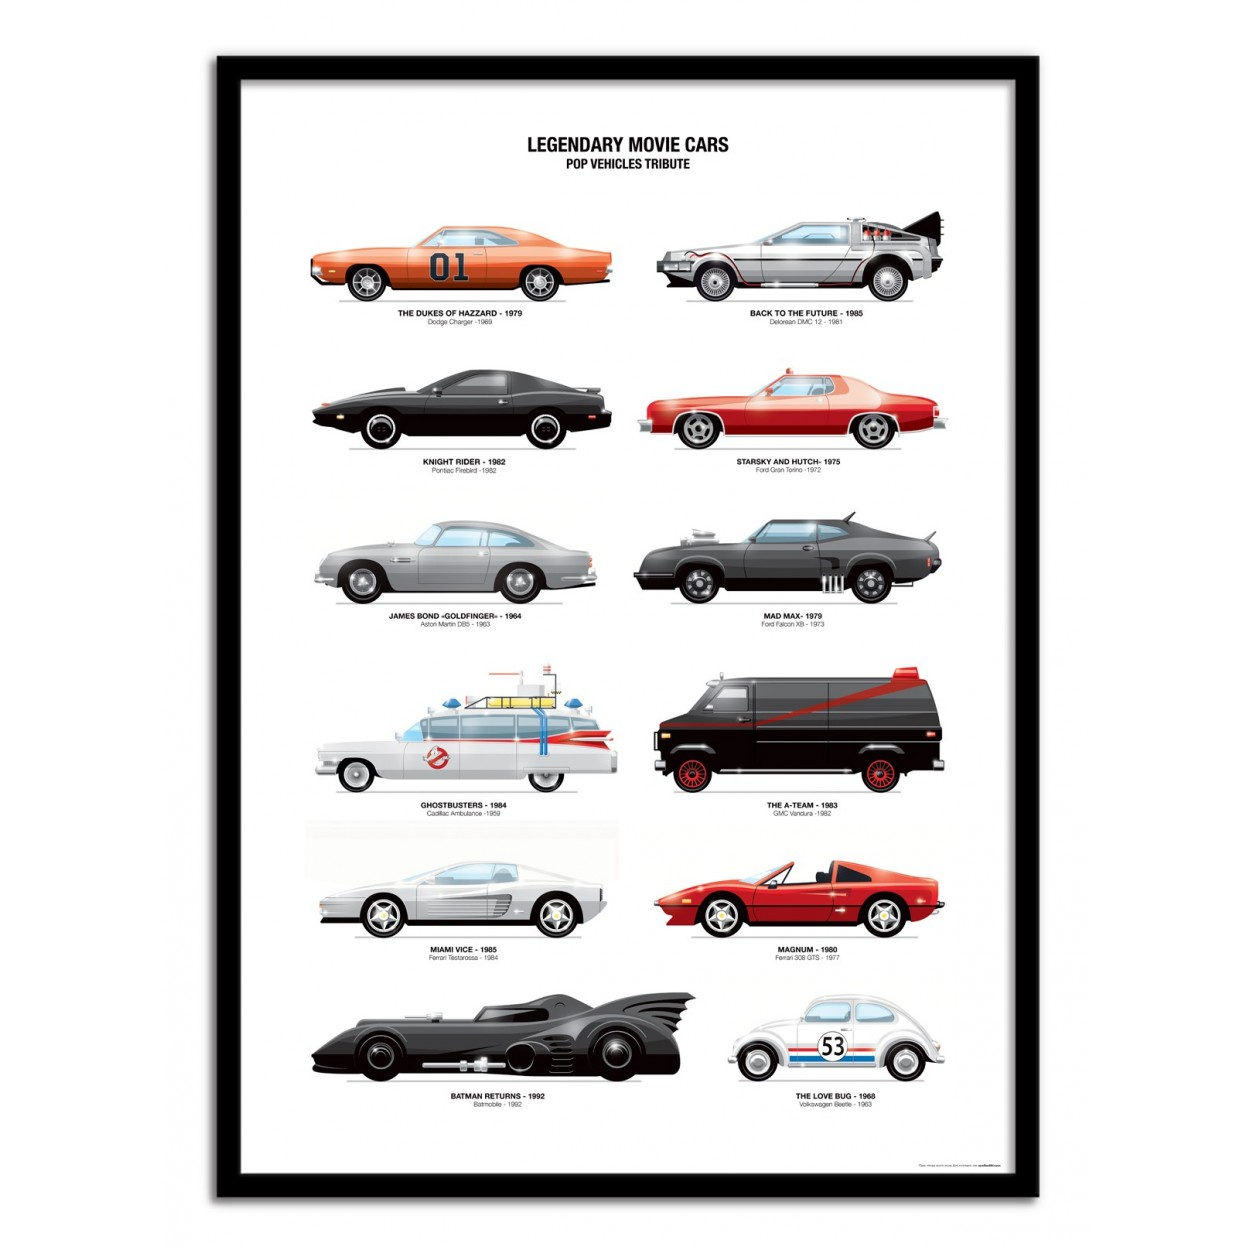 ... Art Poster 50 X 70 Cm   Legendary Movie Cars   Olivier Bourdereau ...